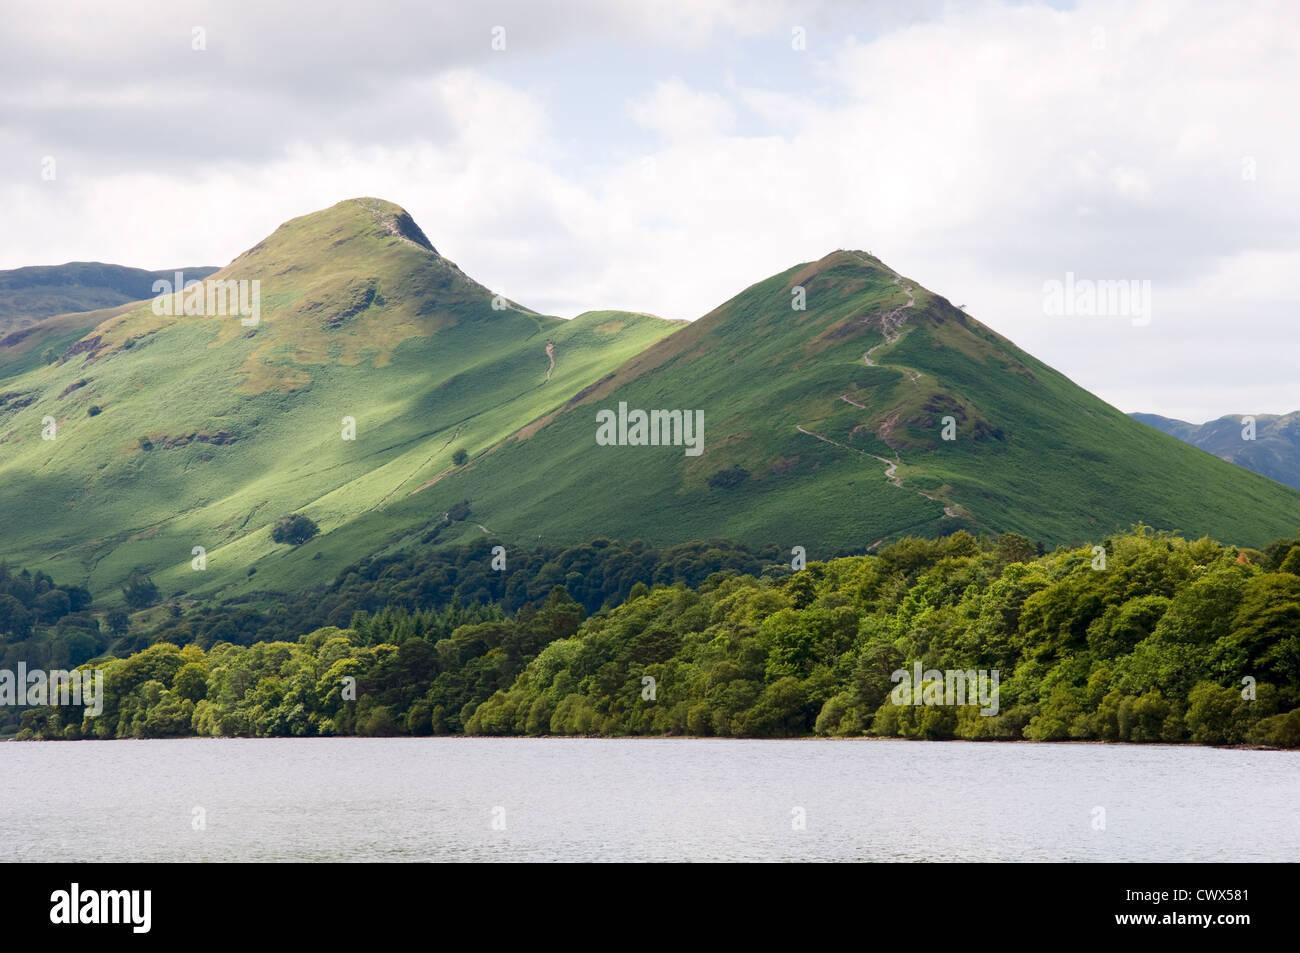 Catbells mountain, Keswick, Lake District National Park, England - Stock Image